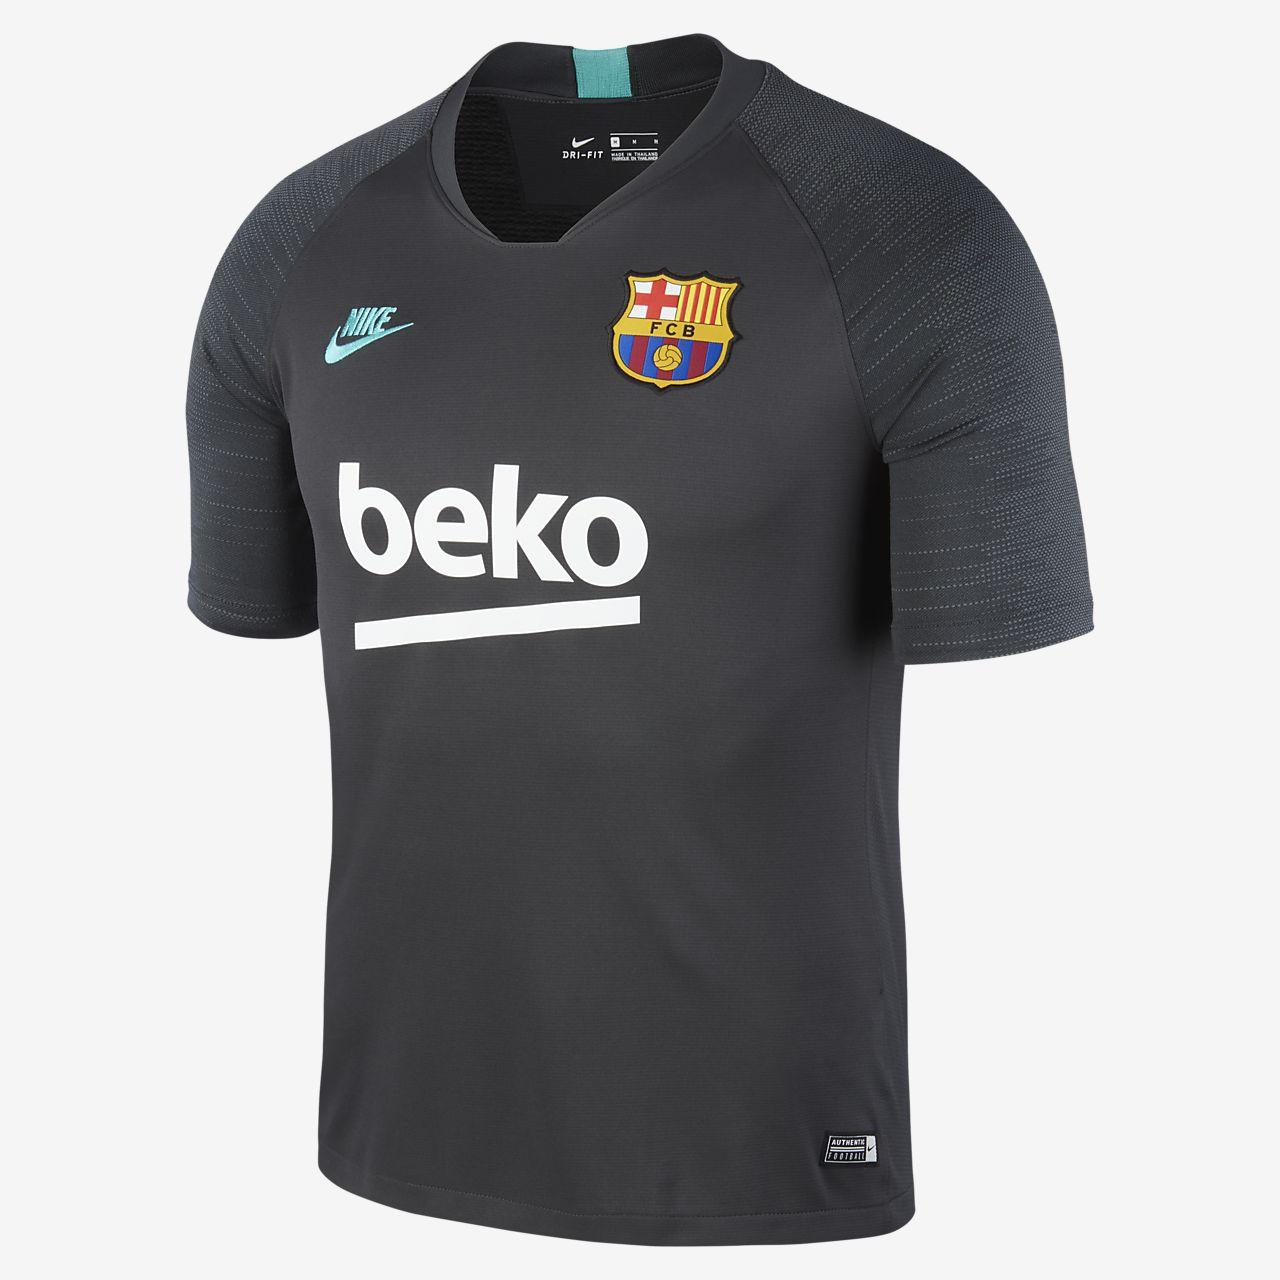 Pánský fotbalový top Nike Breathe FC Barcelona Strike s krátkým rukávem